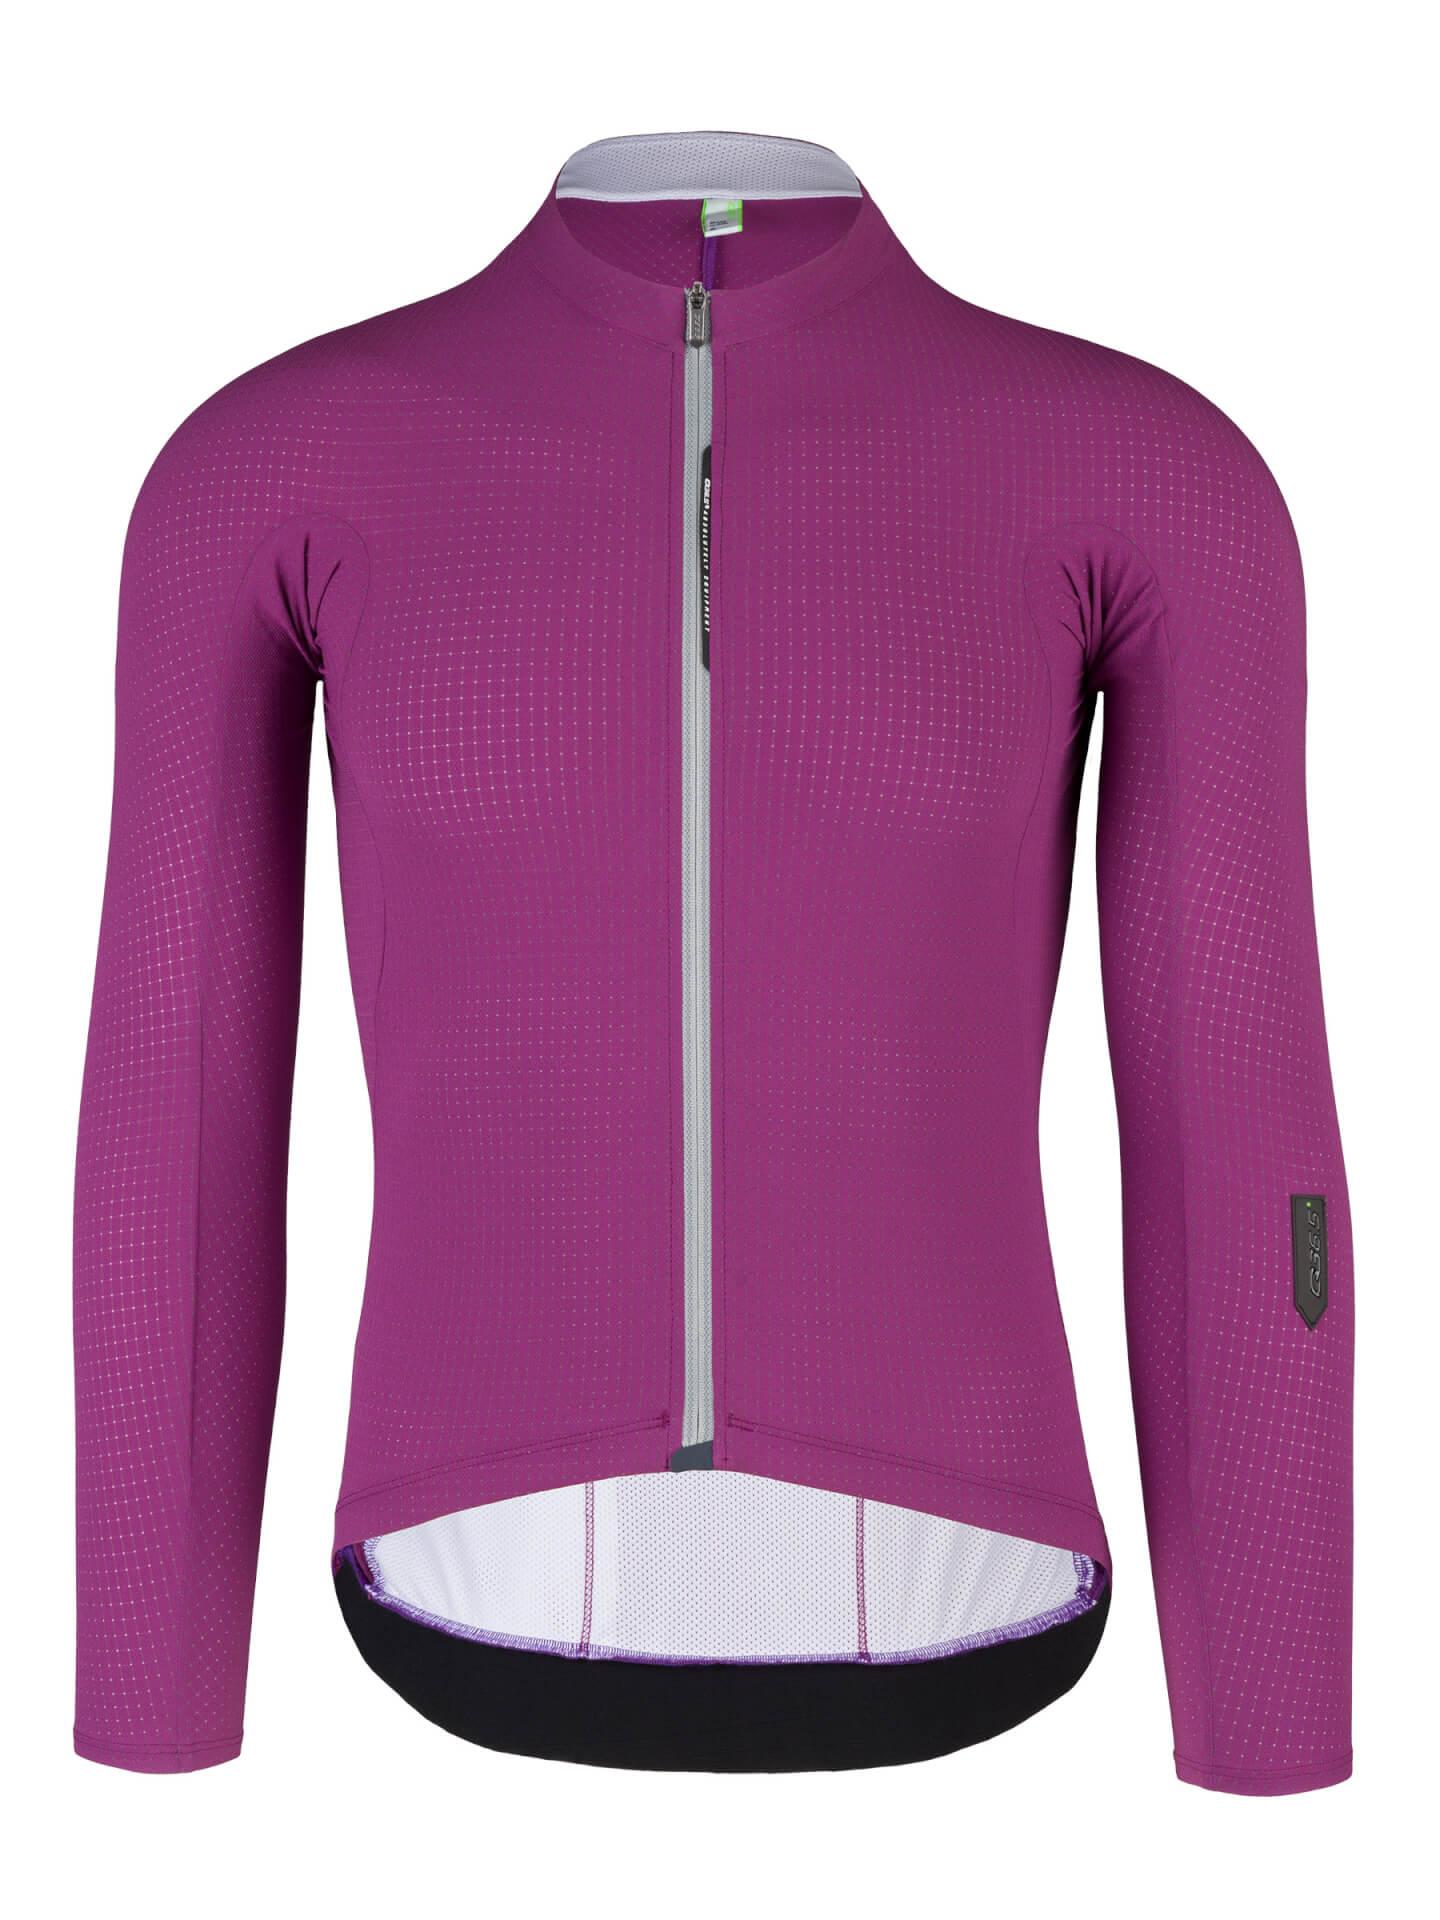 mens cycling jersey pinstripe x purple 027x.11